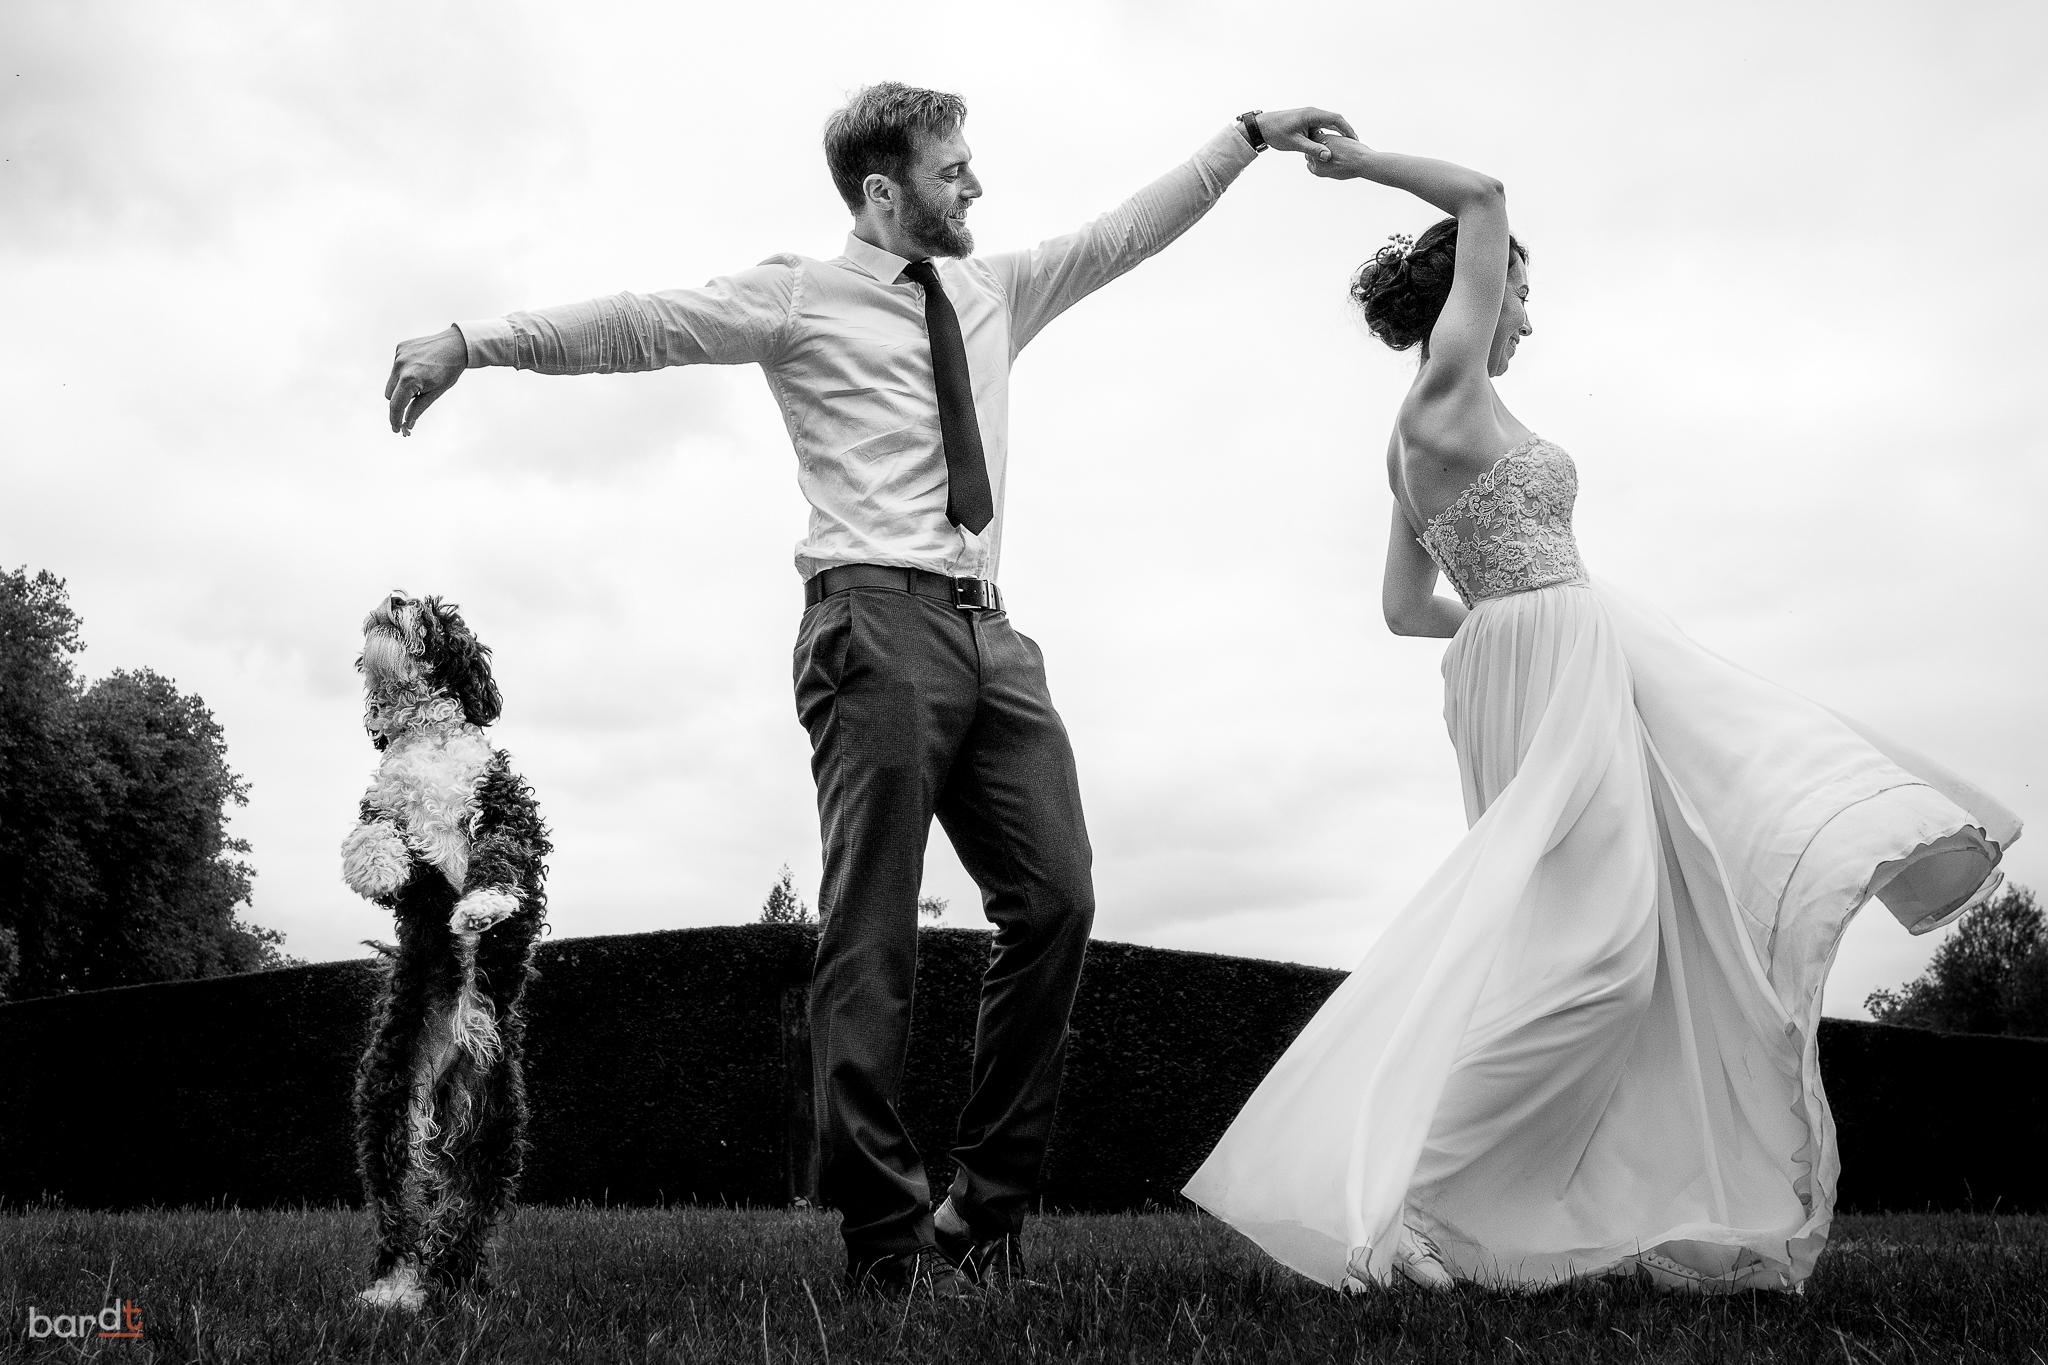 photo by: huwelijksfotograaf Bardt (www.bardt.be)